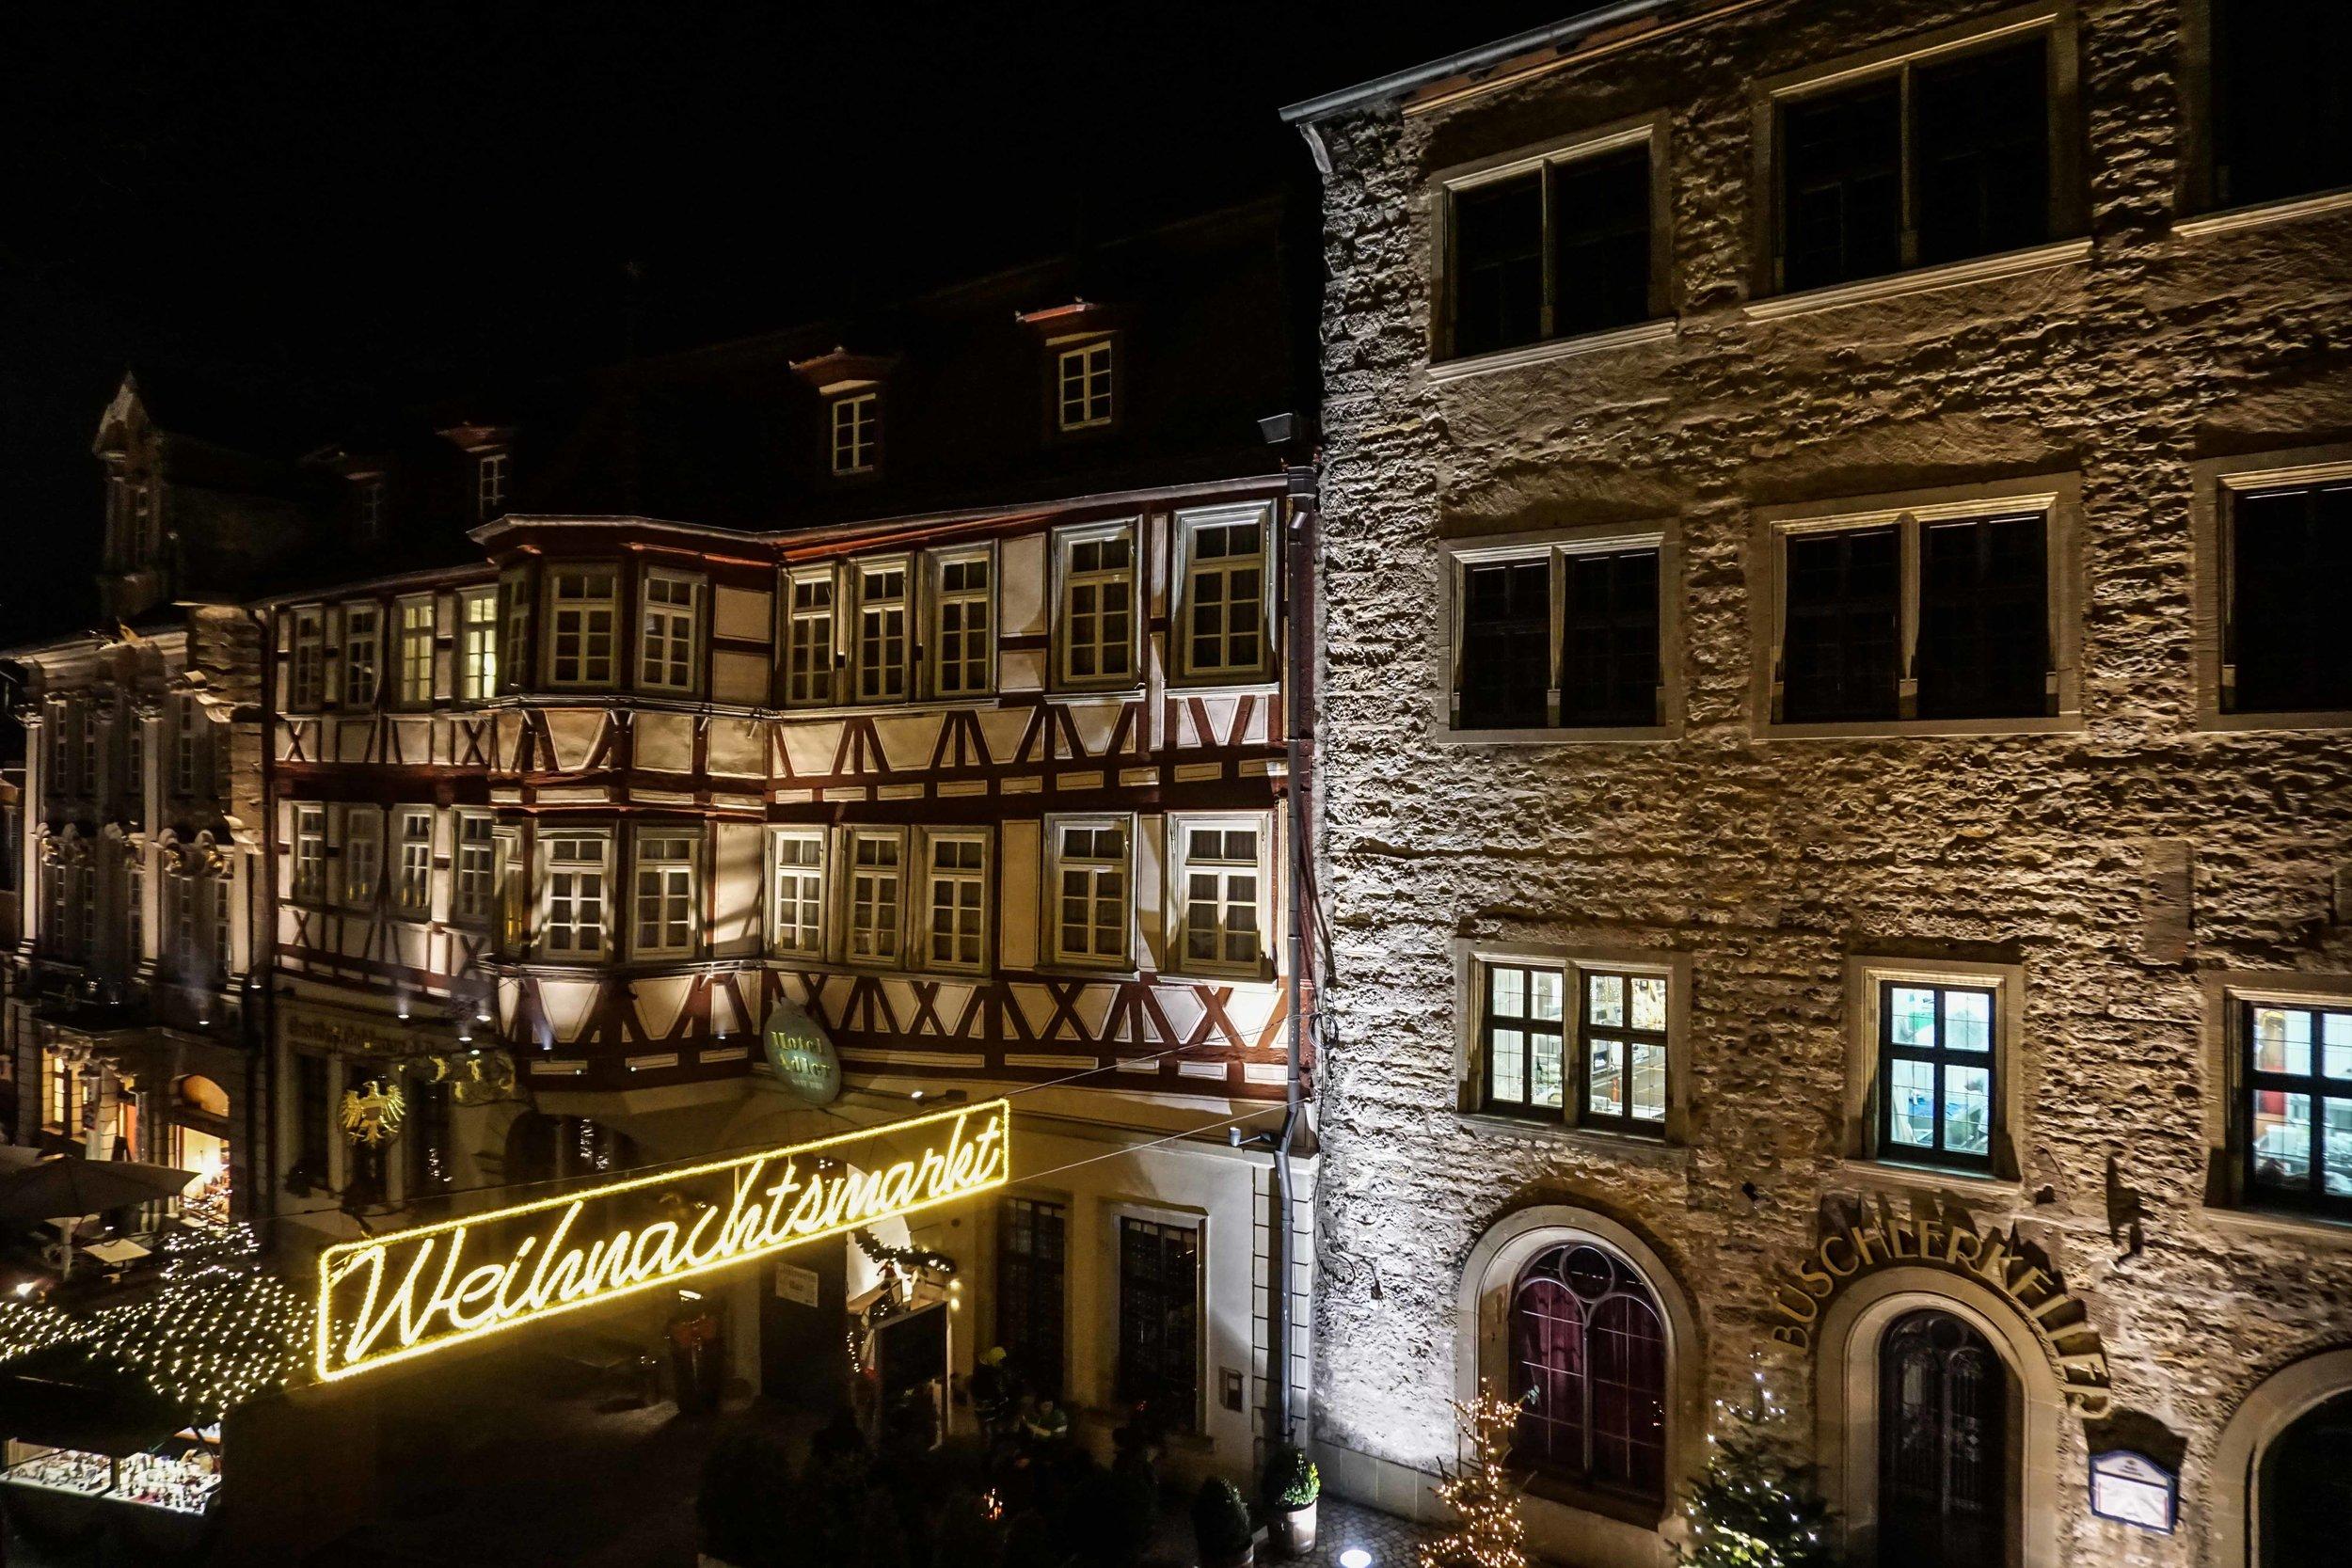 Germany-02934.jpg